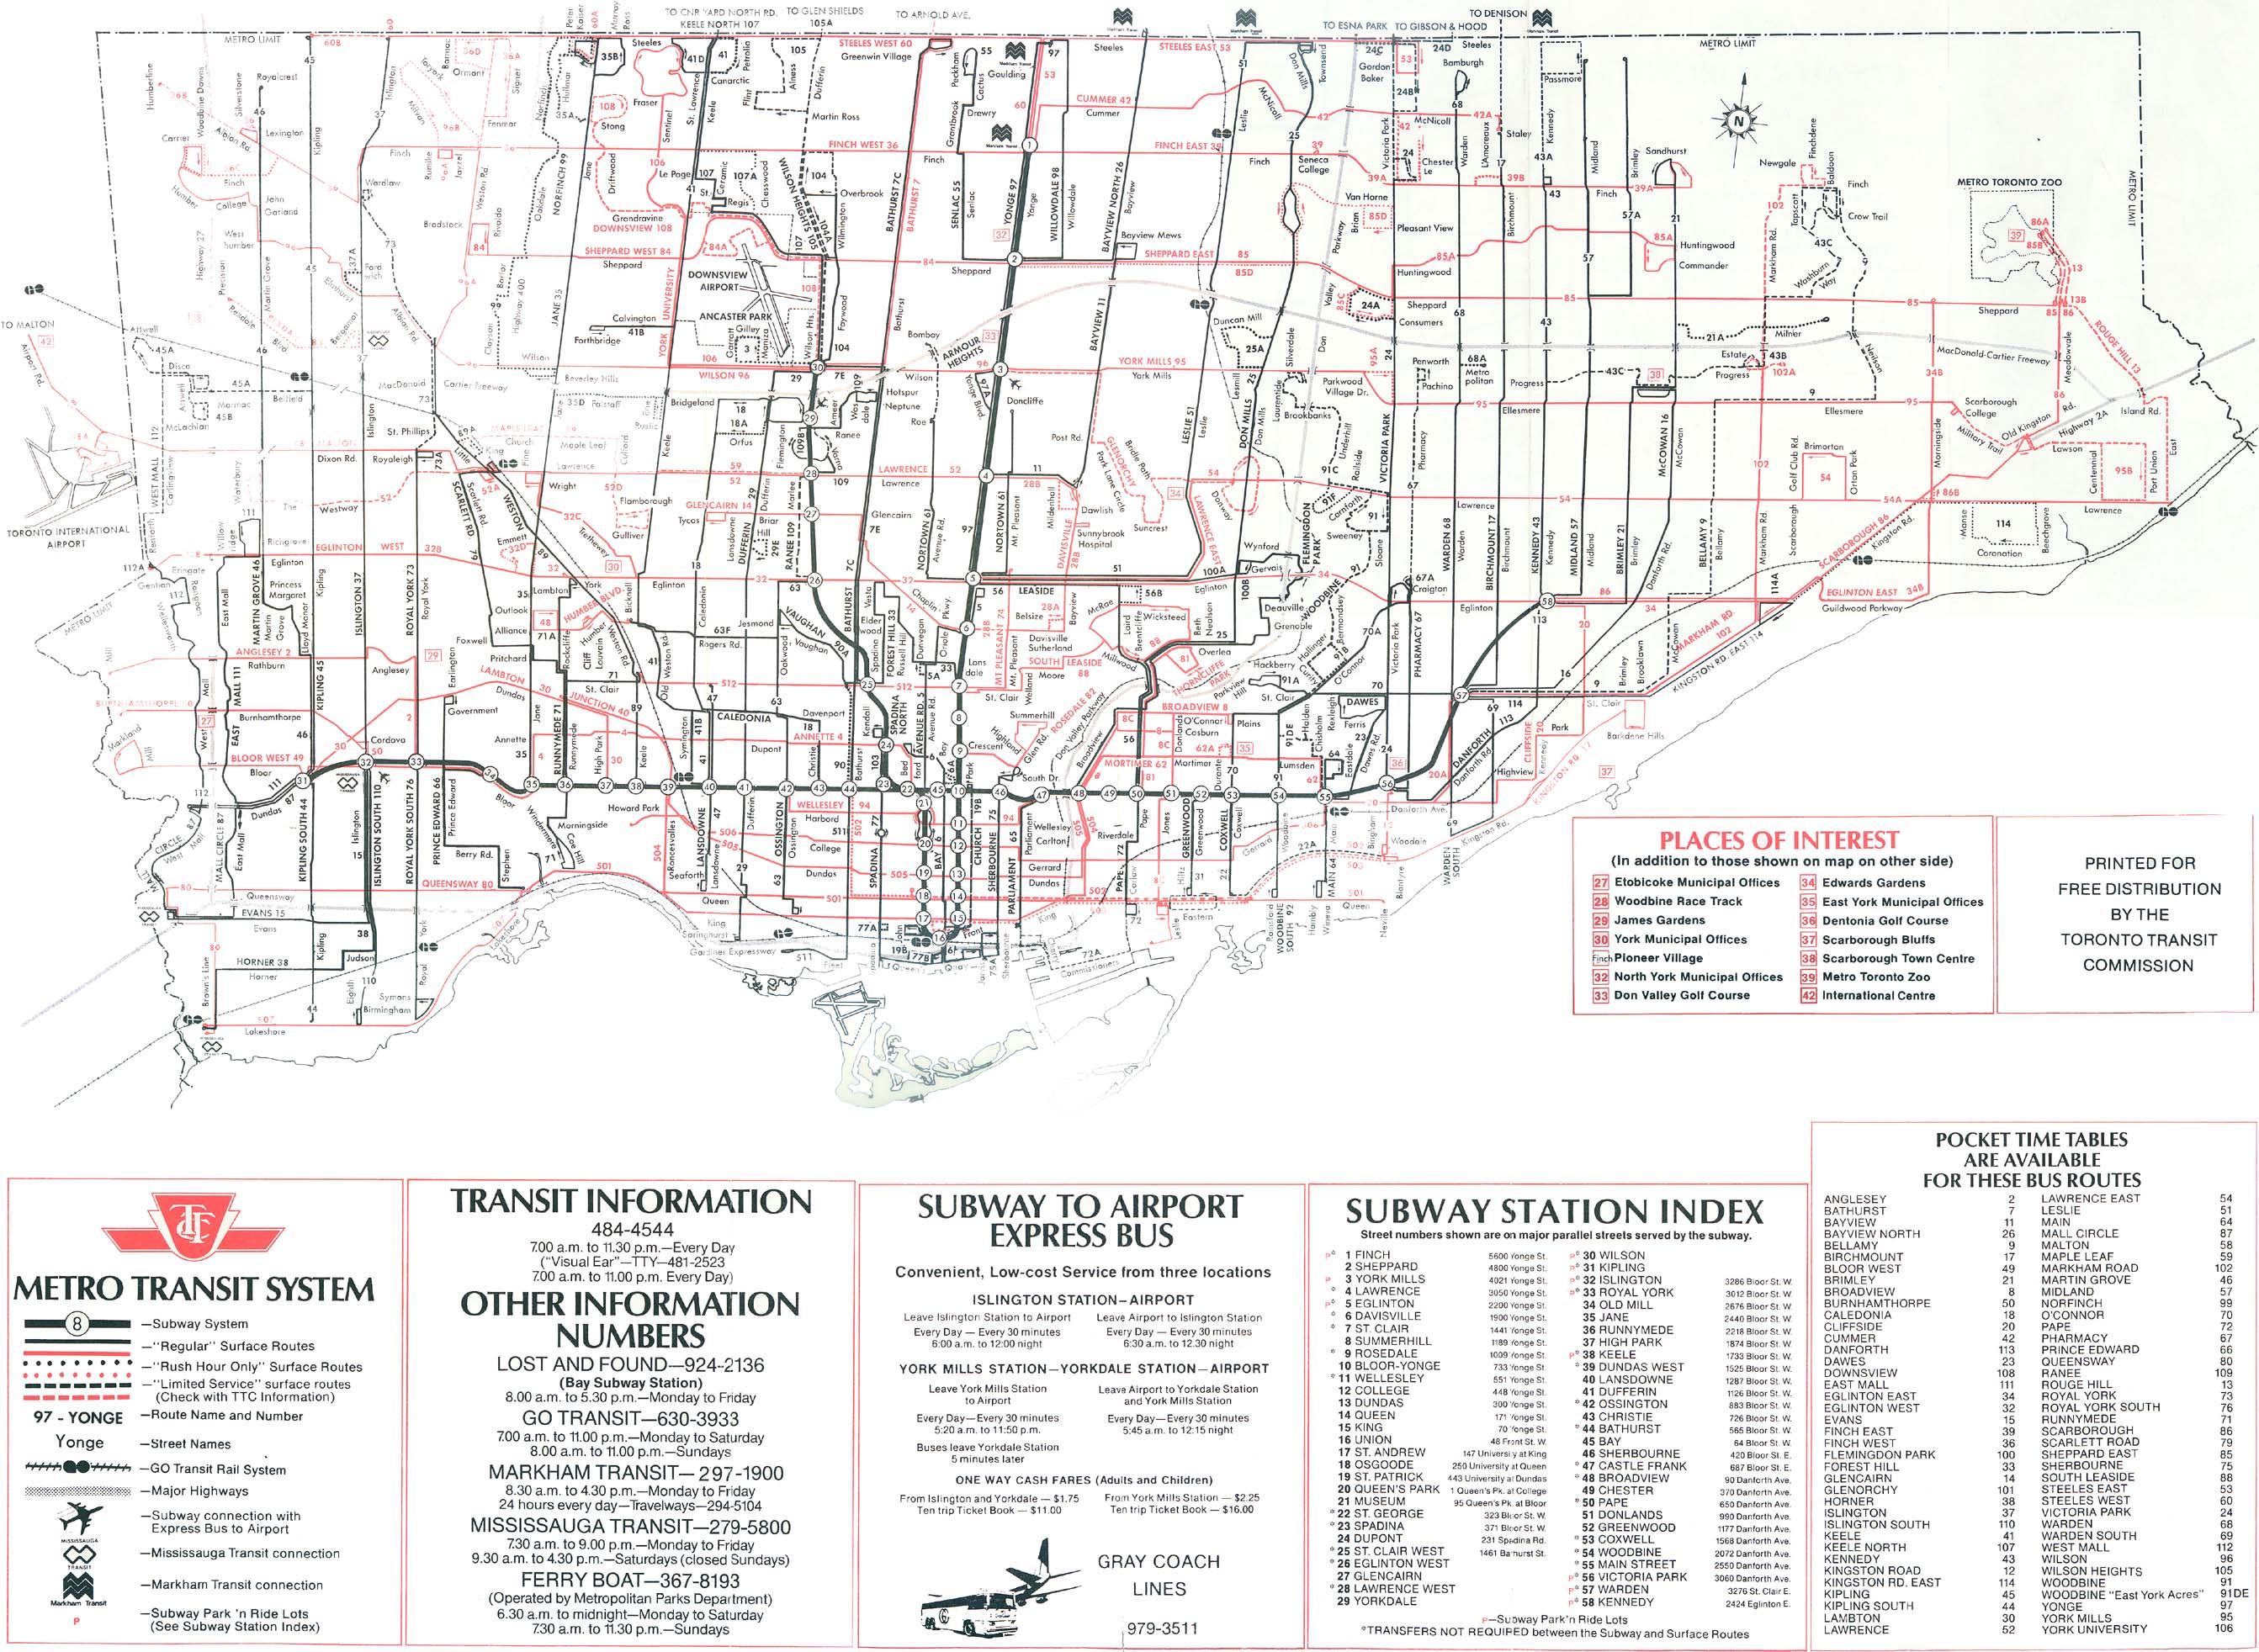 Fantasy Toronto Subway Map.Ttc System Maps Transit Toronto Content